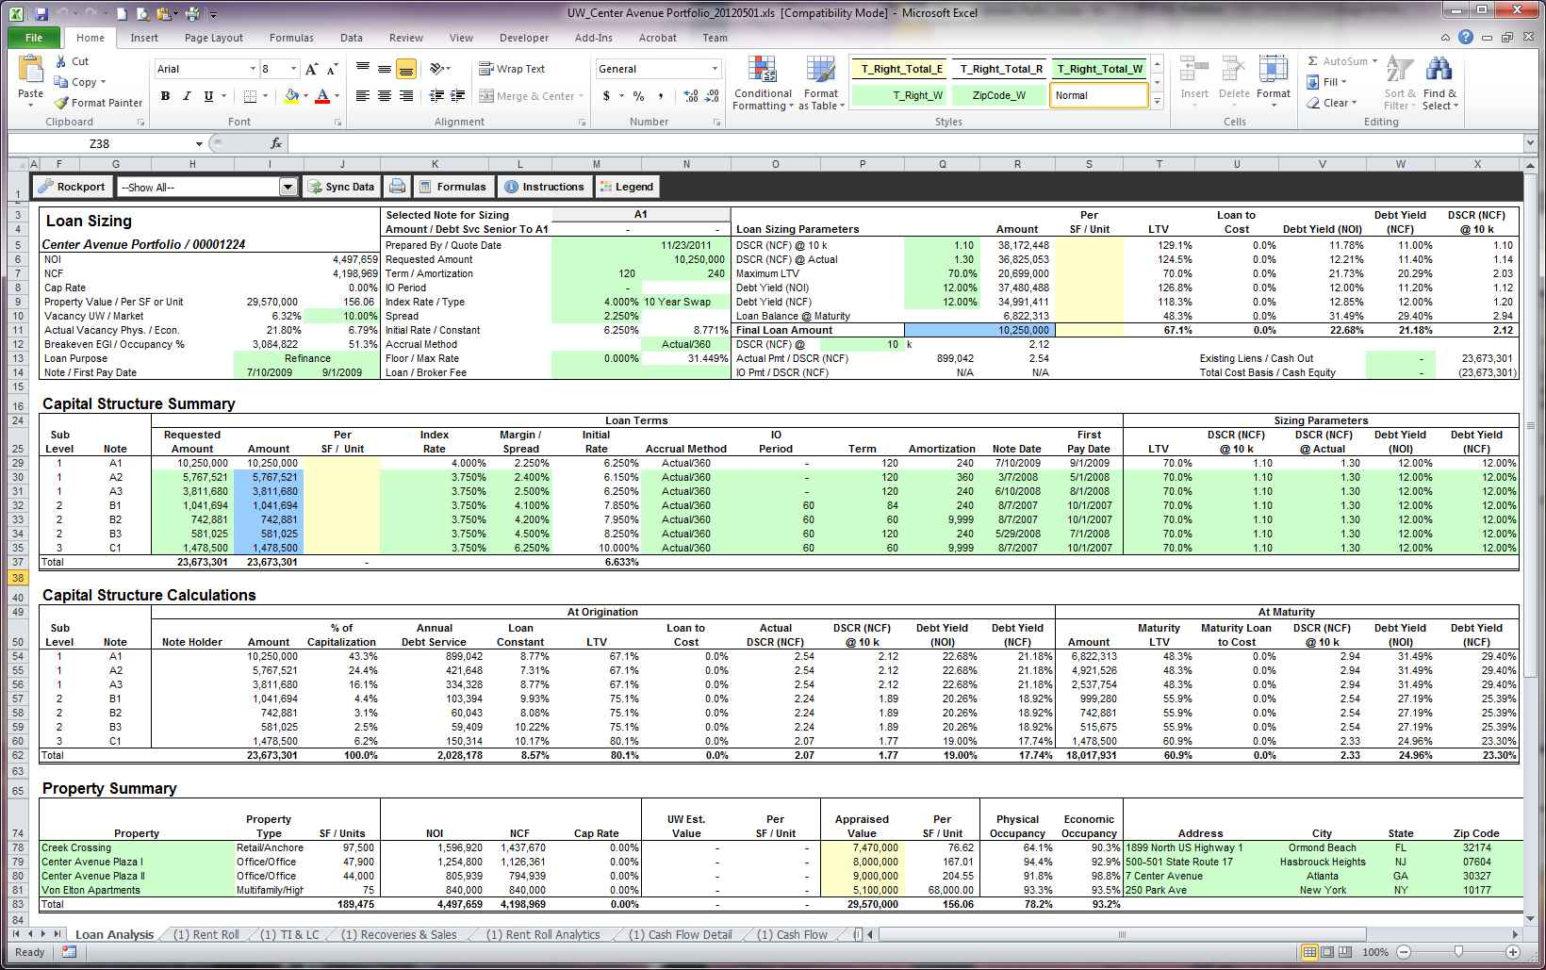 Rental Property Evaluation Spreadsheet In Spreadsheet For Rental Property Analysis And Examples Worksheet Best